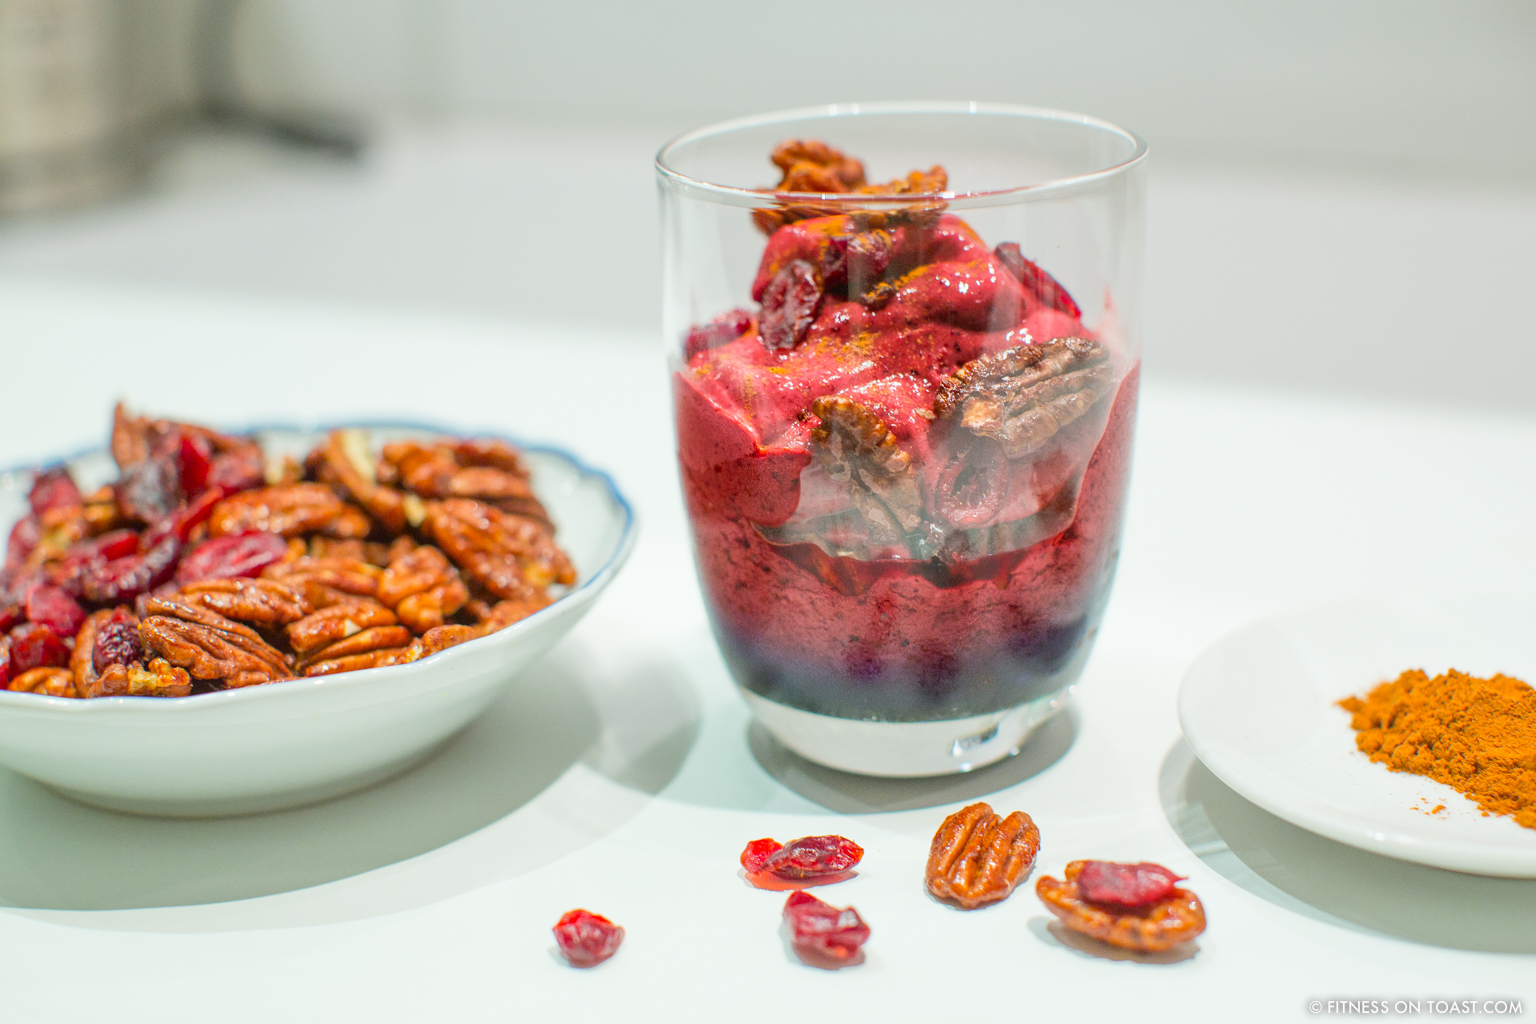 fitness-on-toast-faya-blog-book-girl-health-recipe-tasty-skyr-lidl-food-frozen-yoghurt-festive-winter-dessert-recipe-option